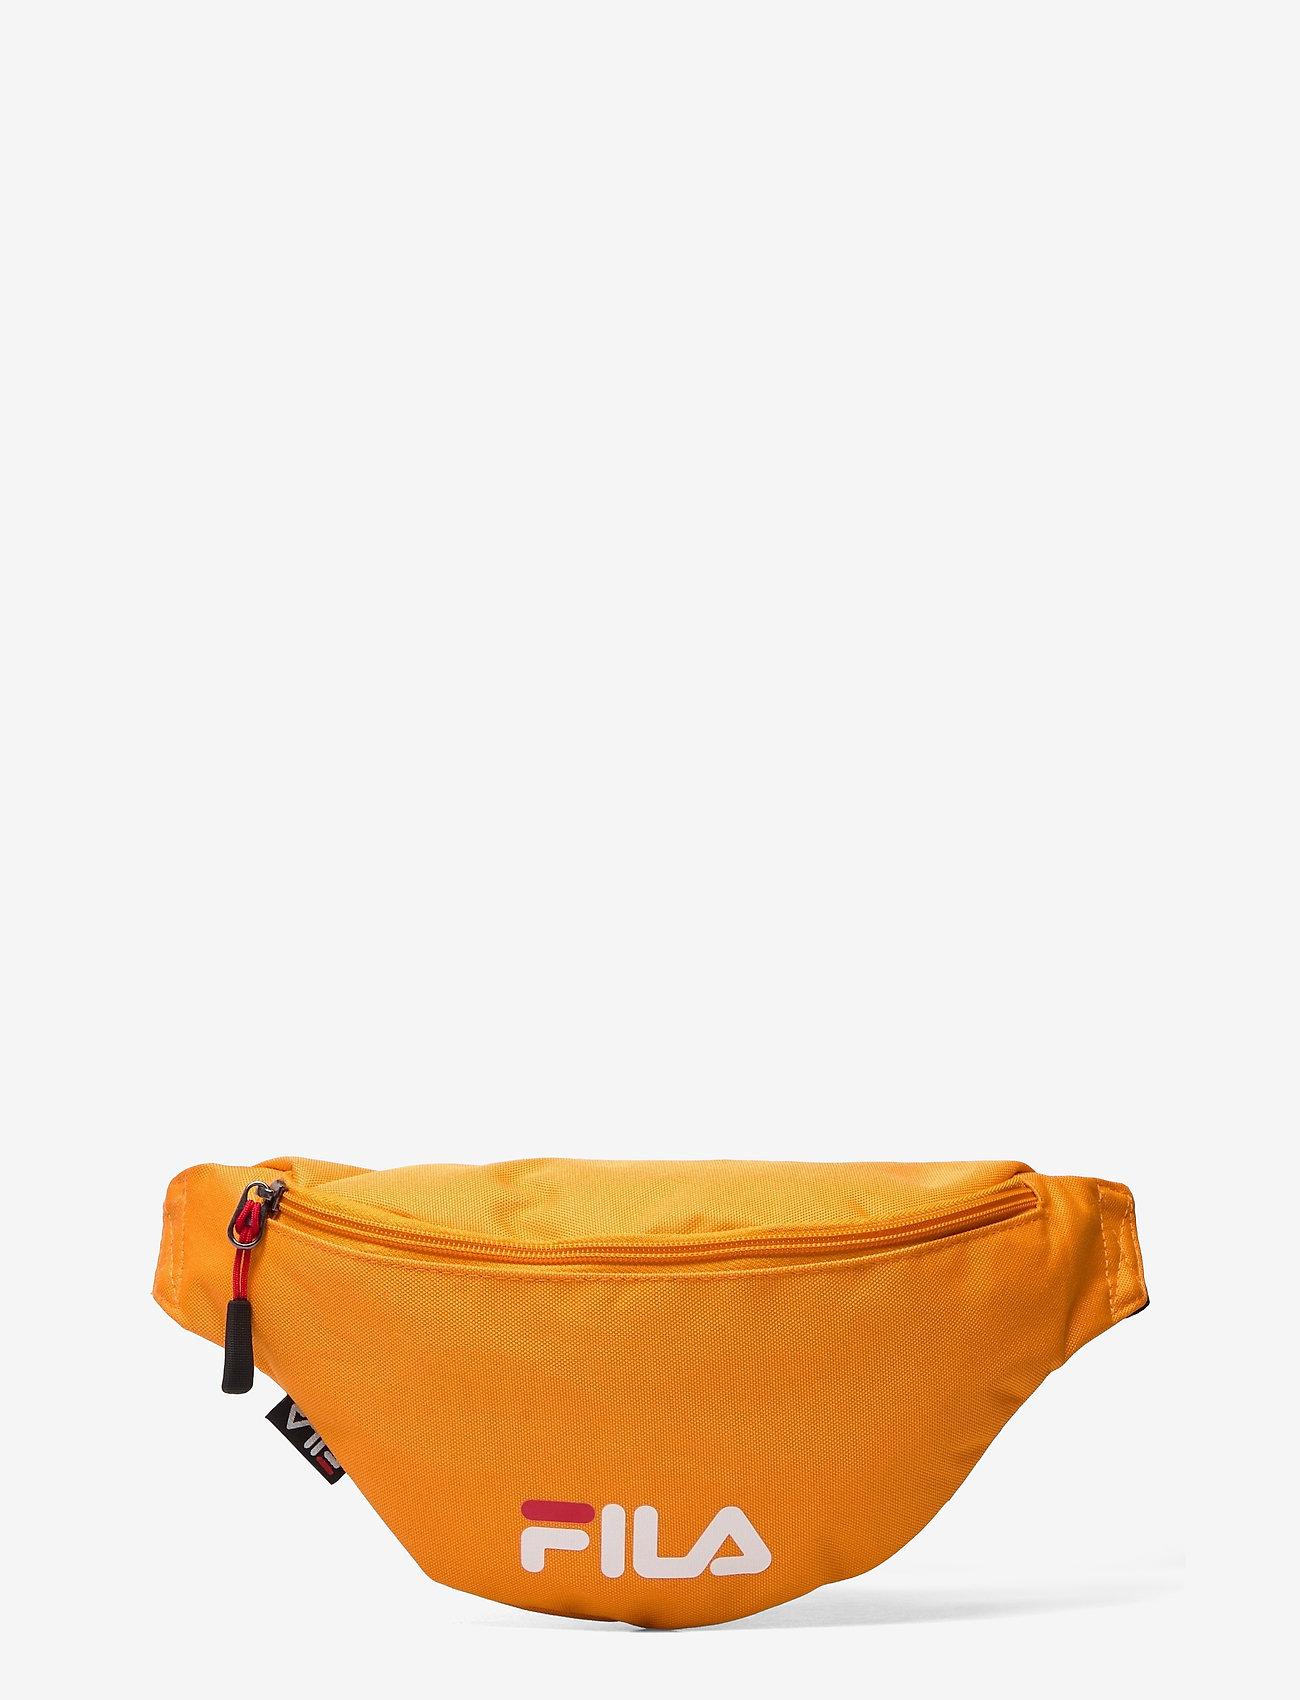 FILA - WAIST BAG SLIM (small logo) - vyölaukut - flame orange - 0